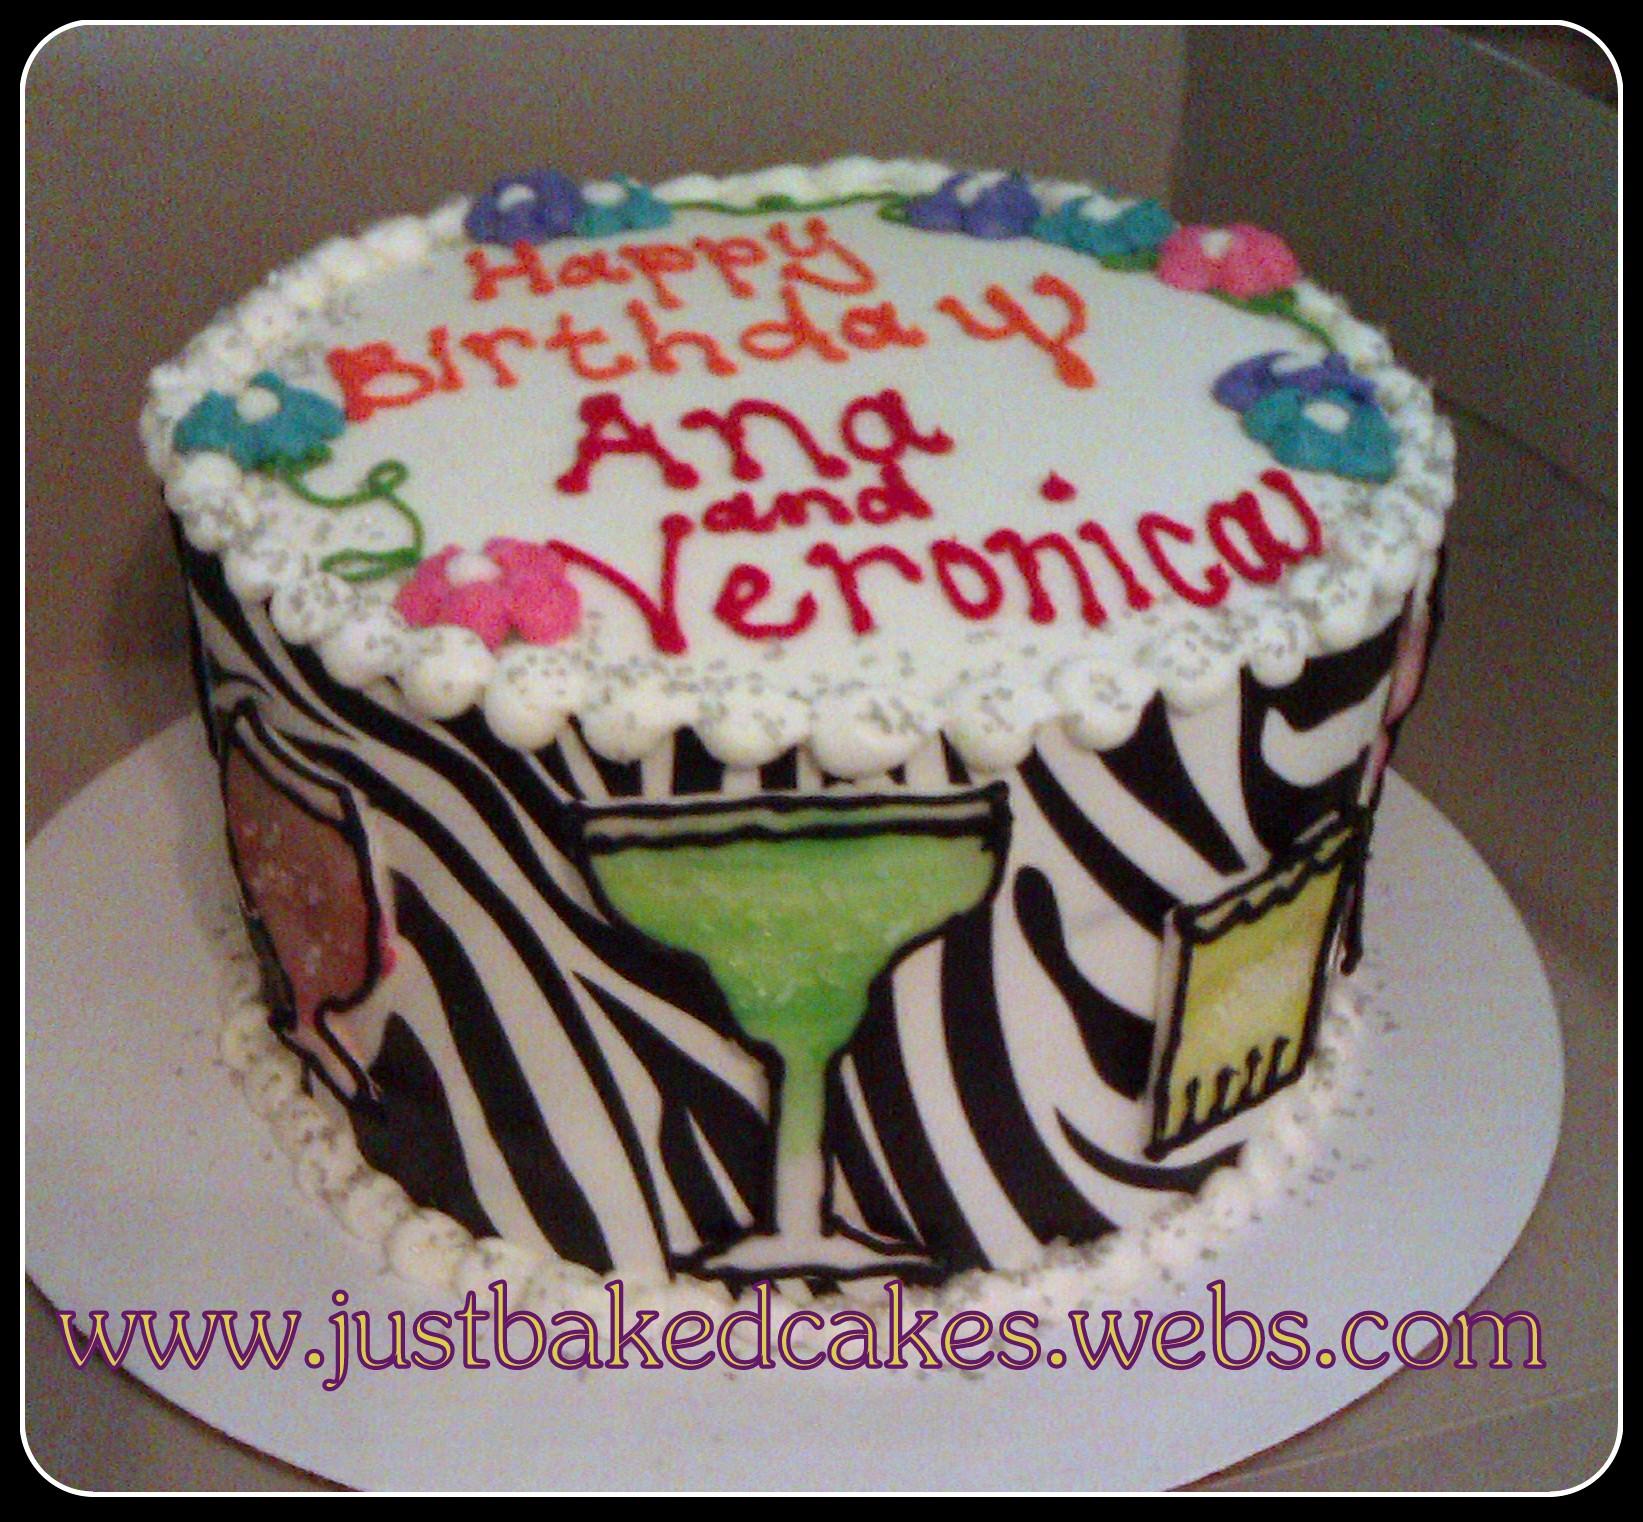 Zebra Cocktails Mixed Drinks Birthday Cake